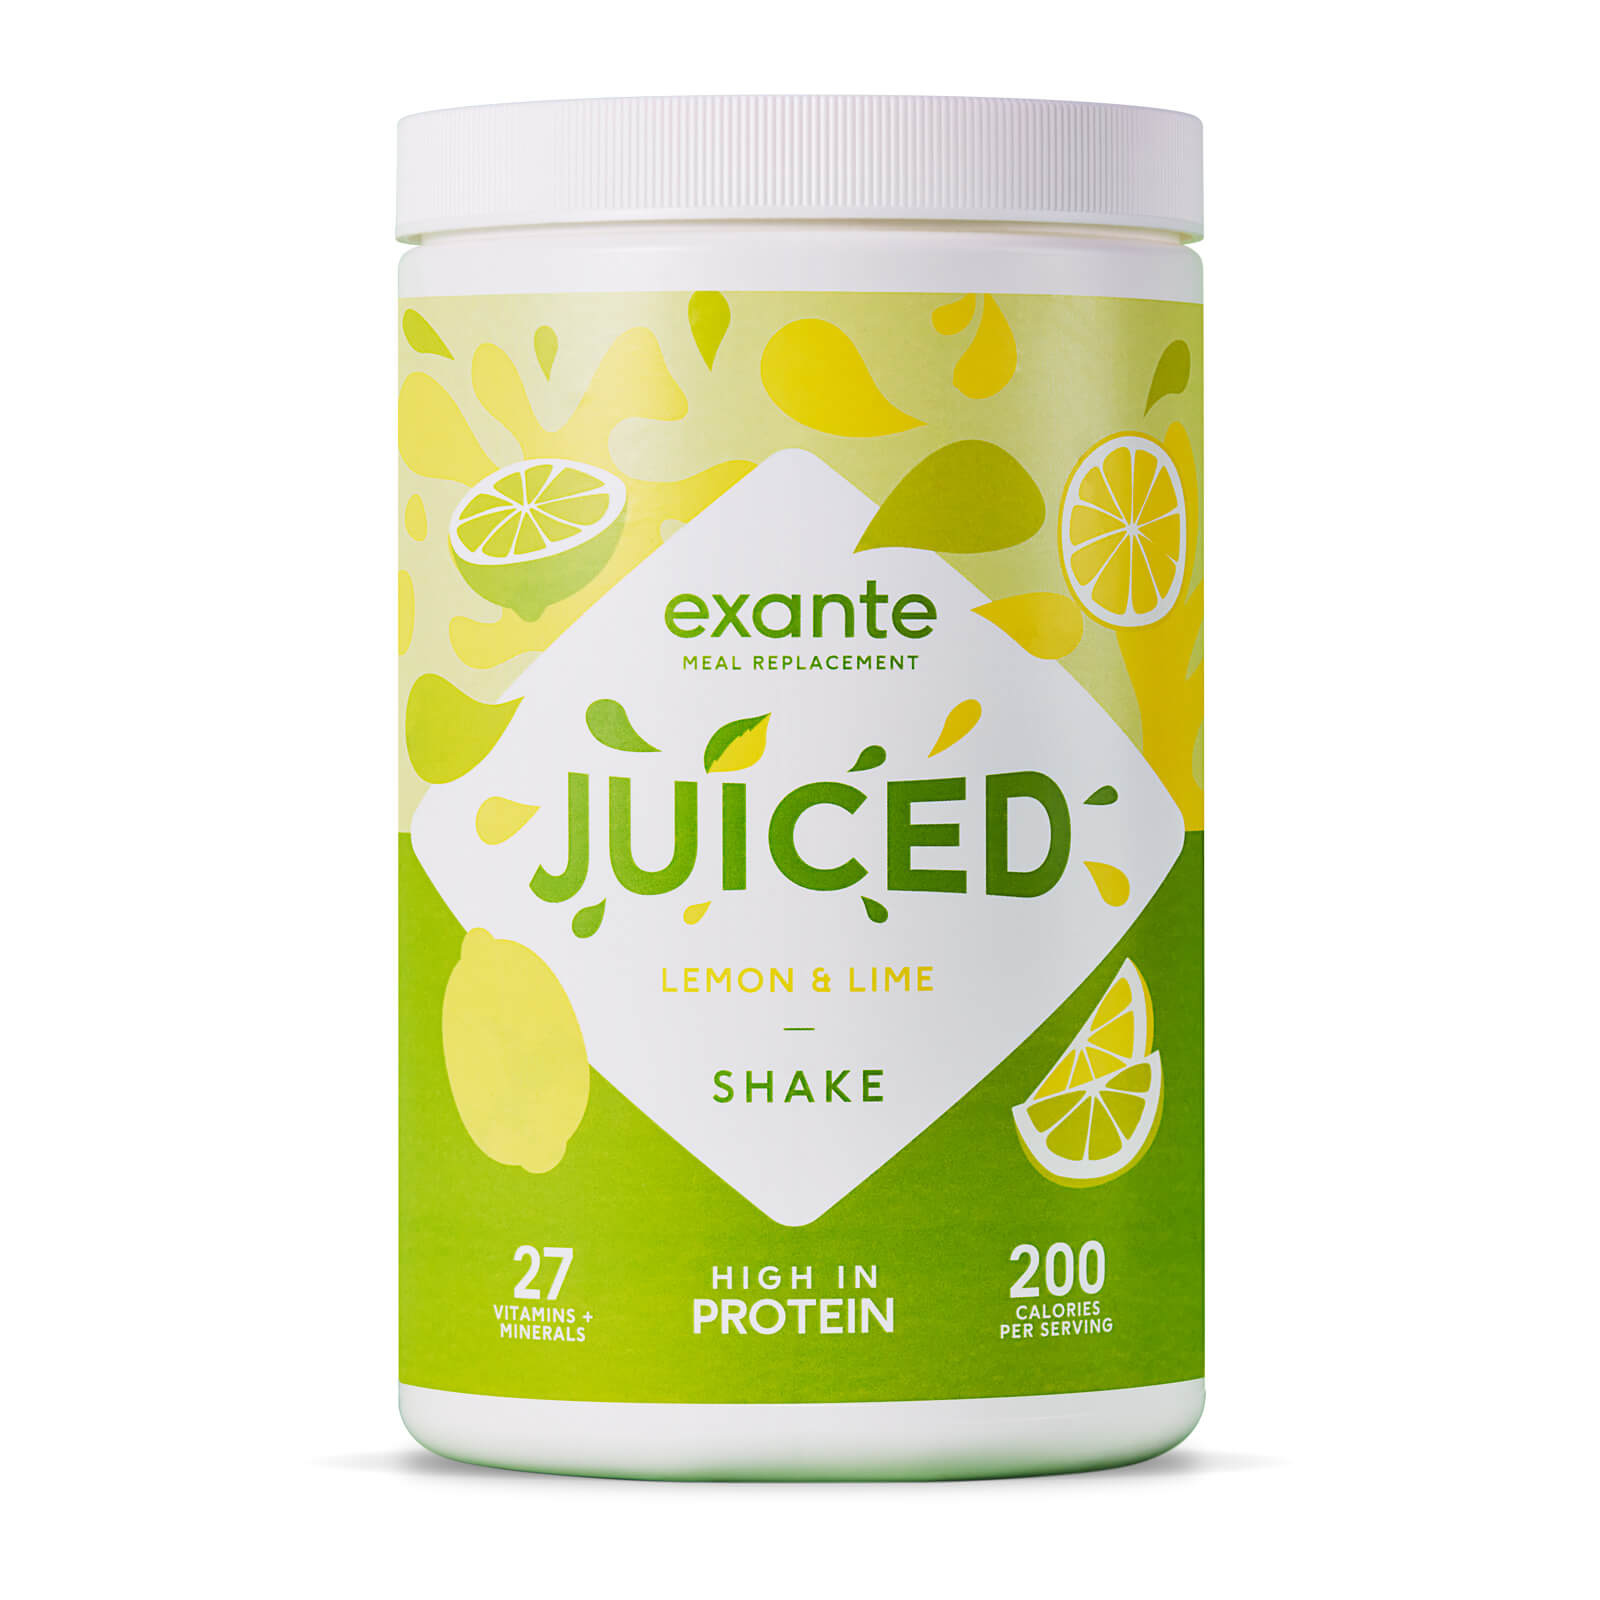 JUICED Zitrone & Limone - 10 Portionen